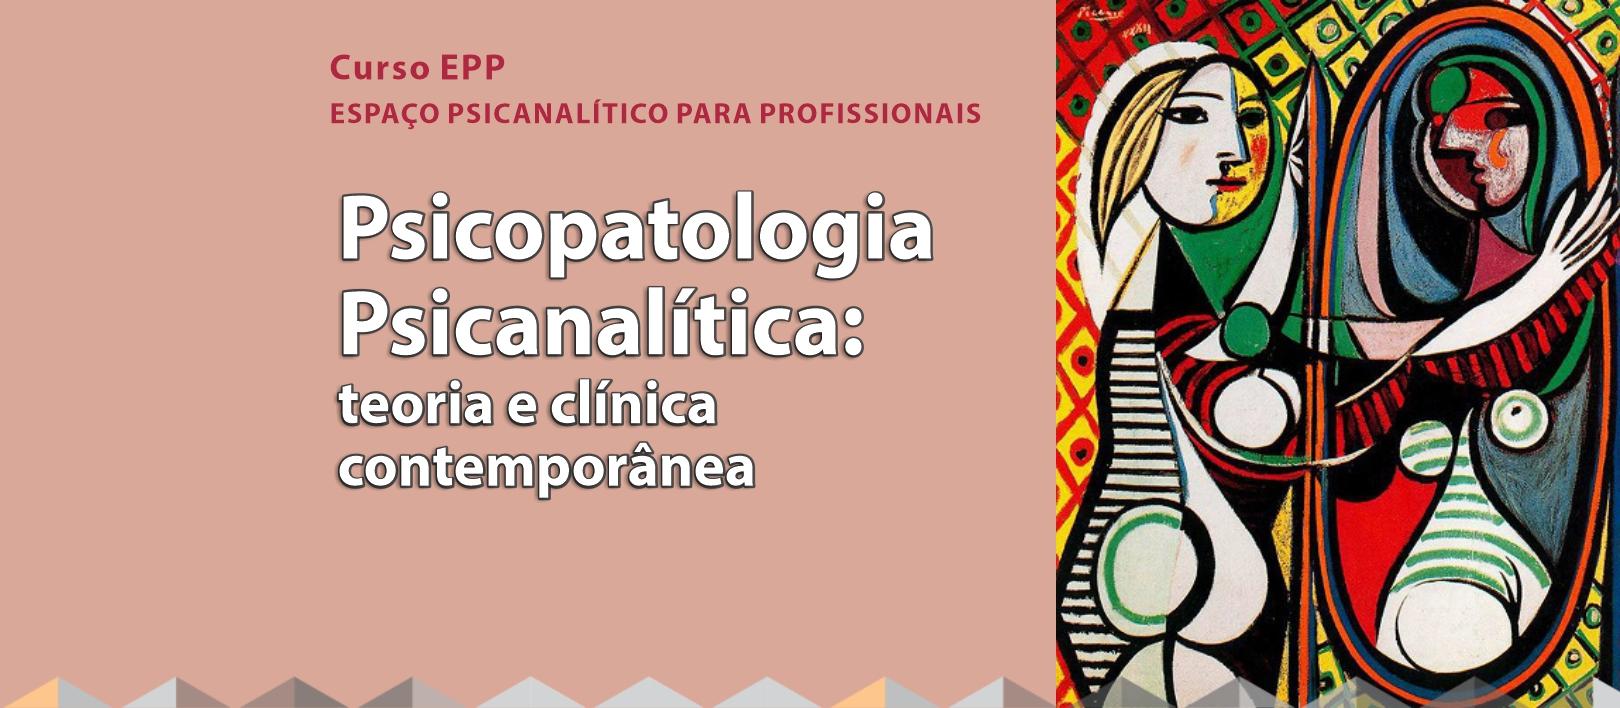 Psicopatologia Psicanalítica: teoria e clínica contemporânea